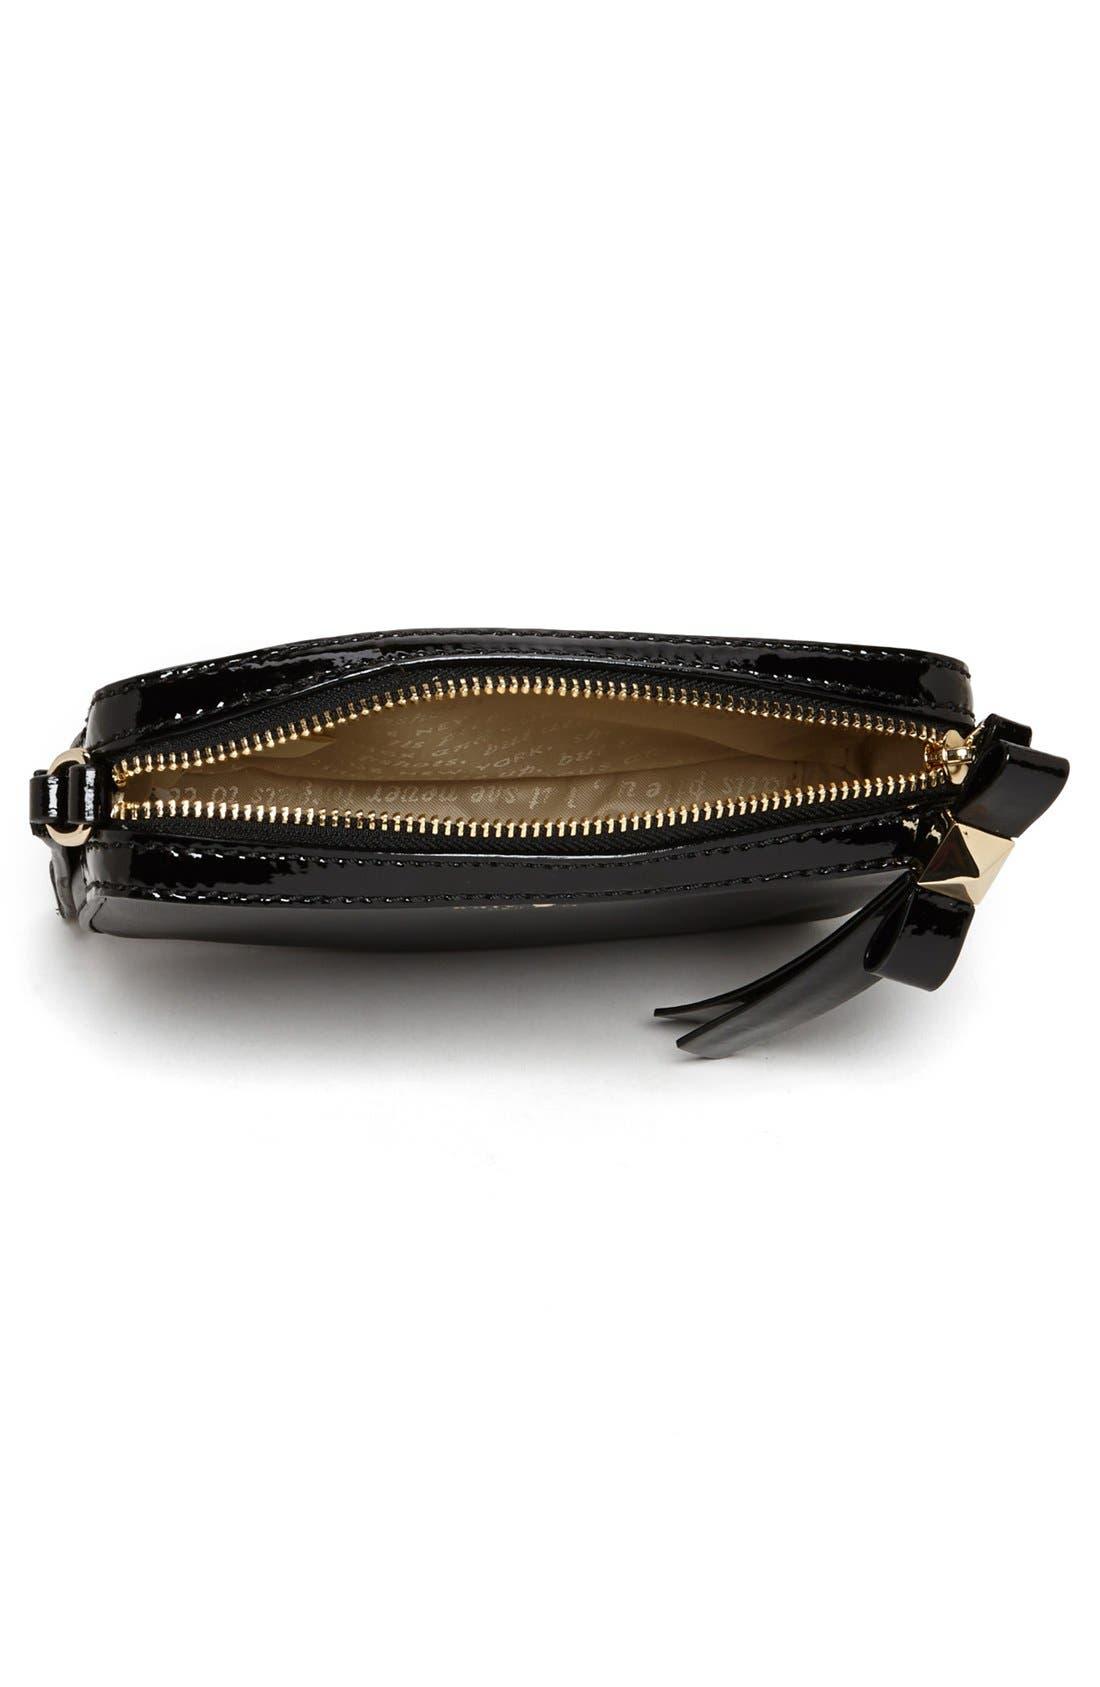 Alternate Image 3  - kate spade new york 'clover' leather crossbody bag